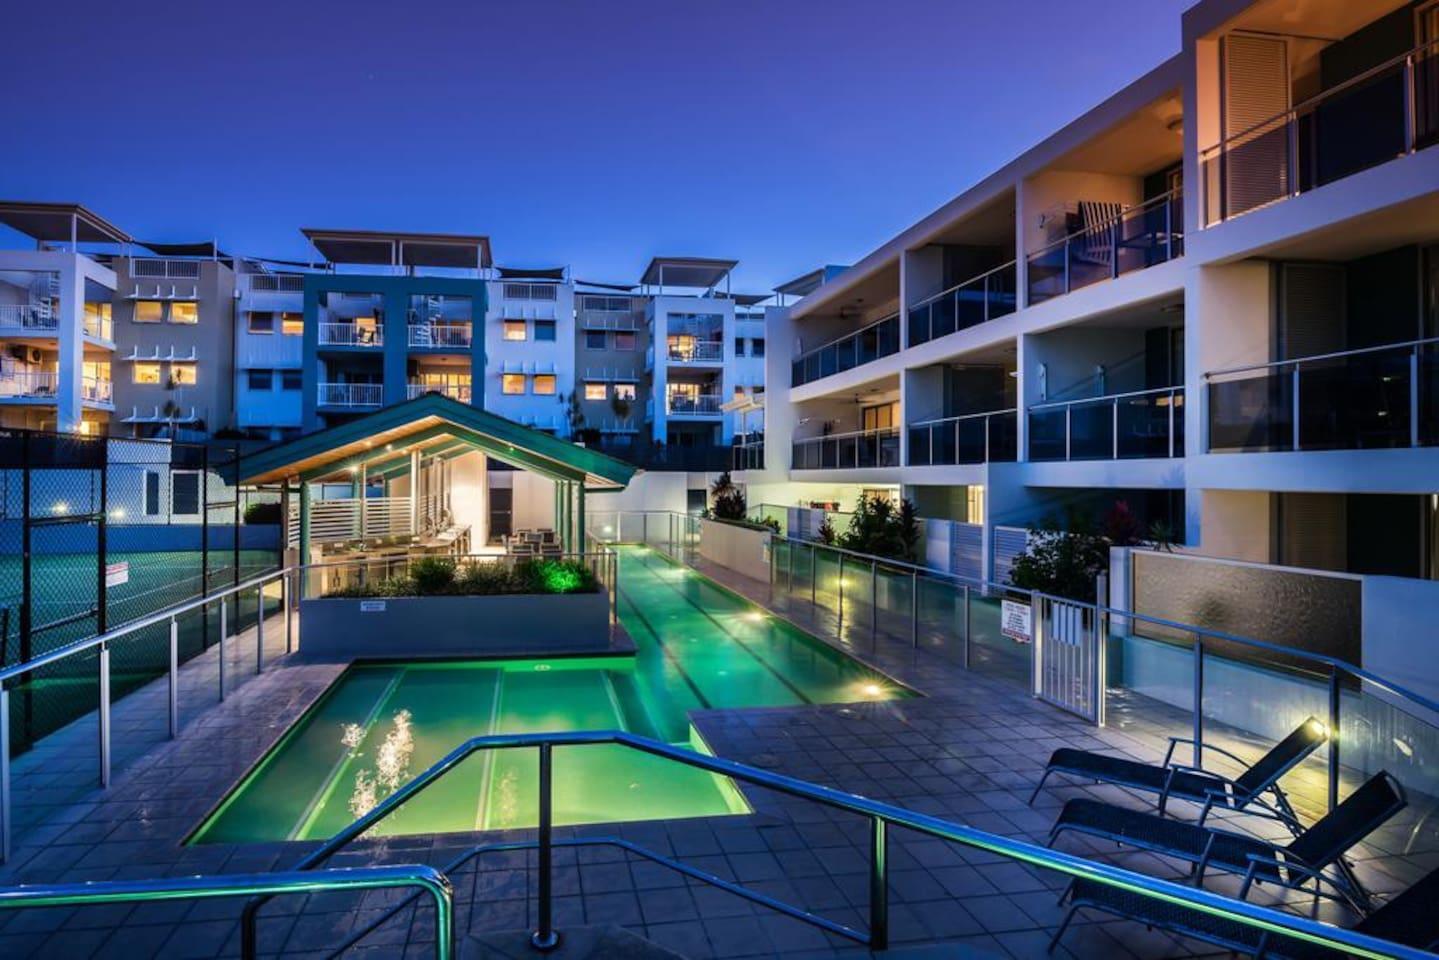 Apartment 2BR Coolum Beach    Rooftop Terrace   Spa   Tennis   Pool photo 26289859